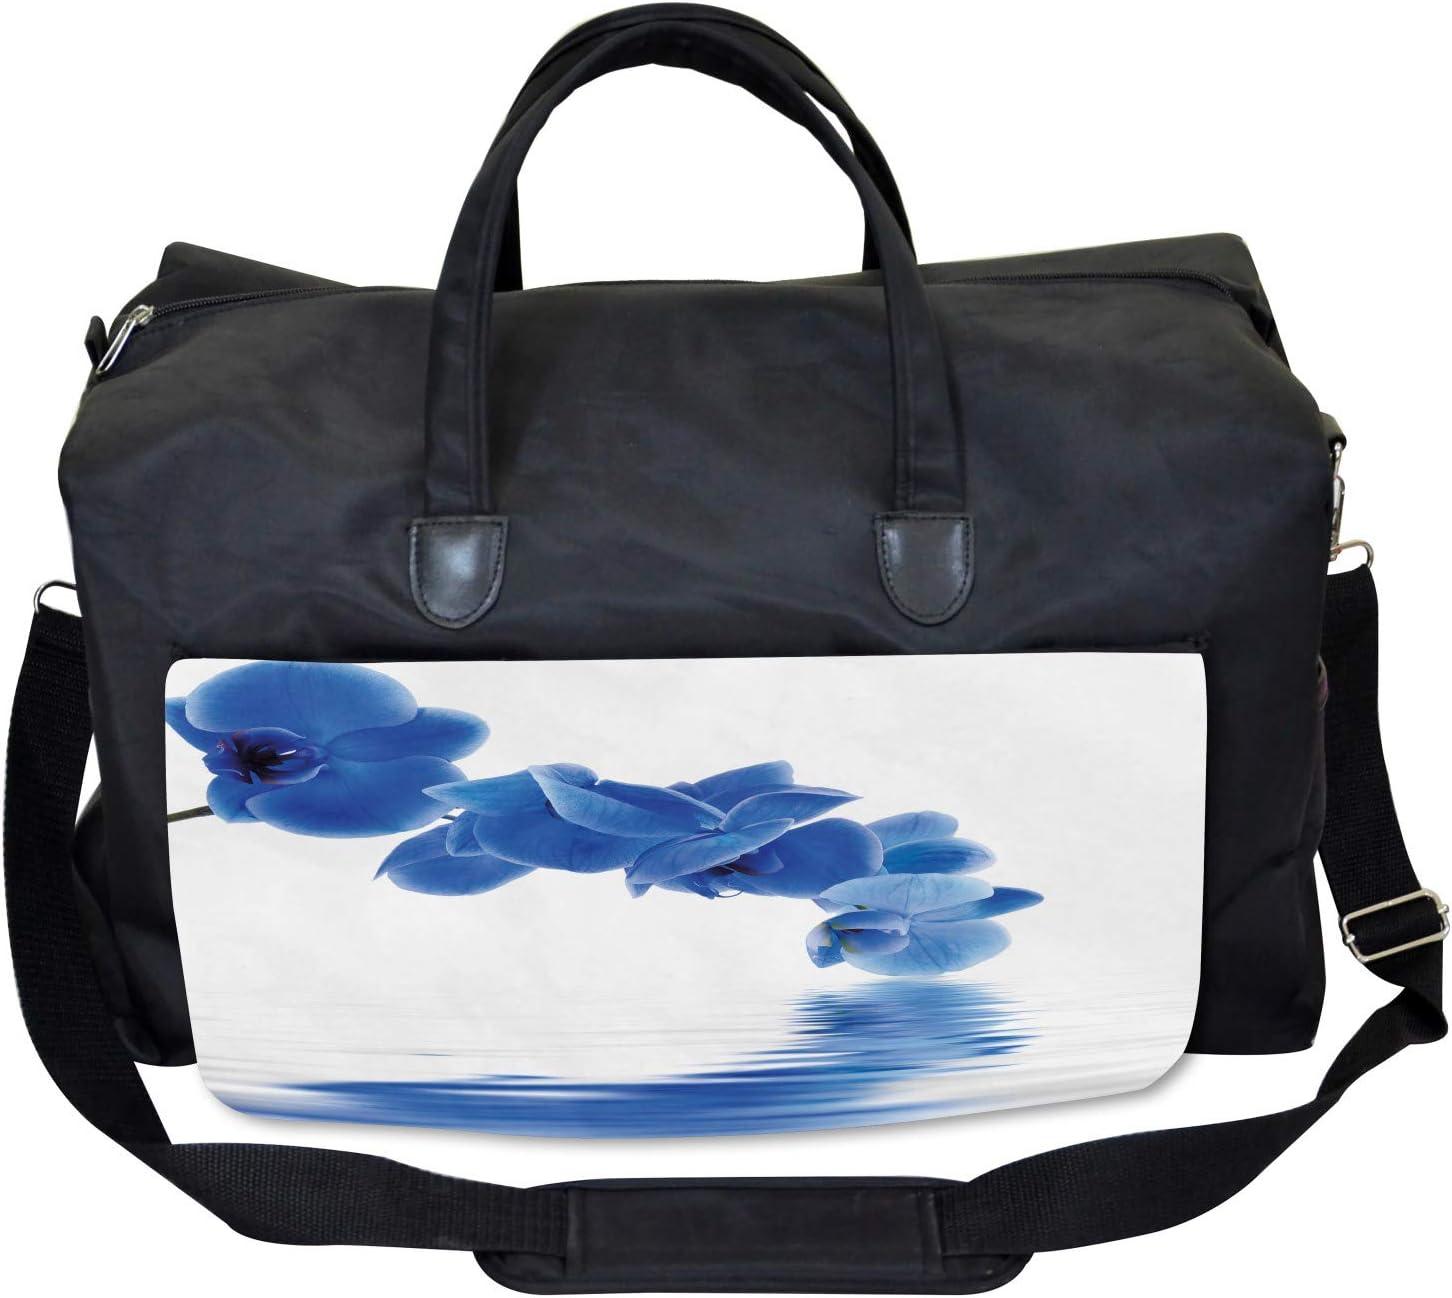 Orchid Zen Bridal Large Weekender Carry-on Ambesonne Blue Gym Bag